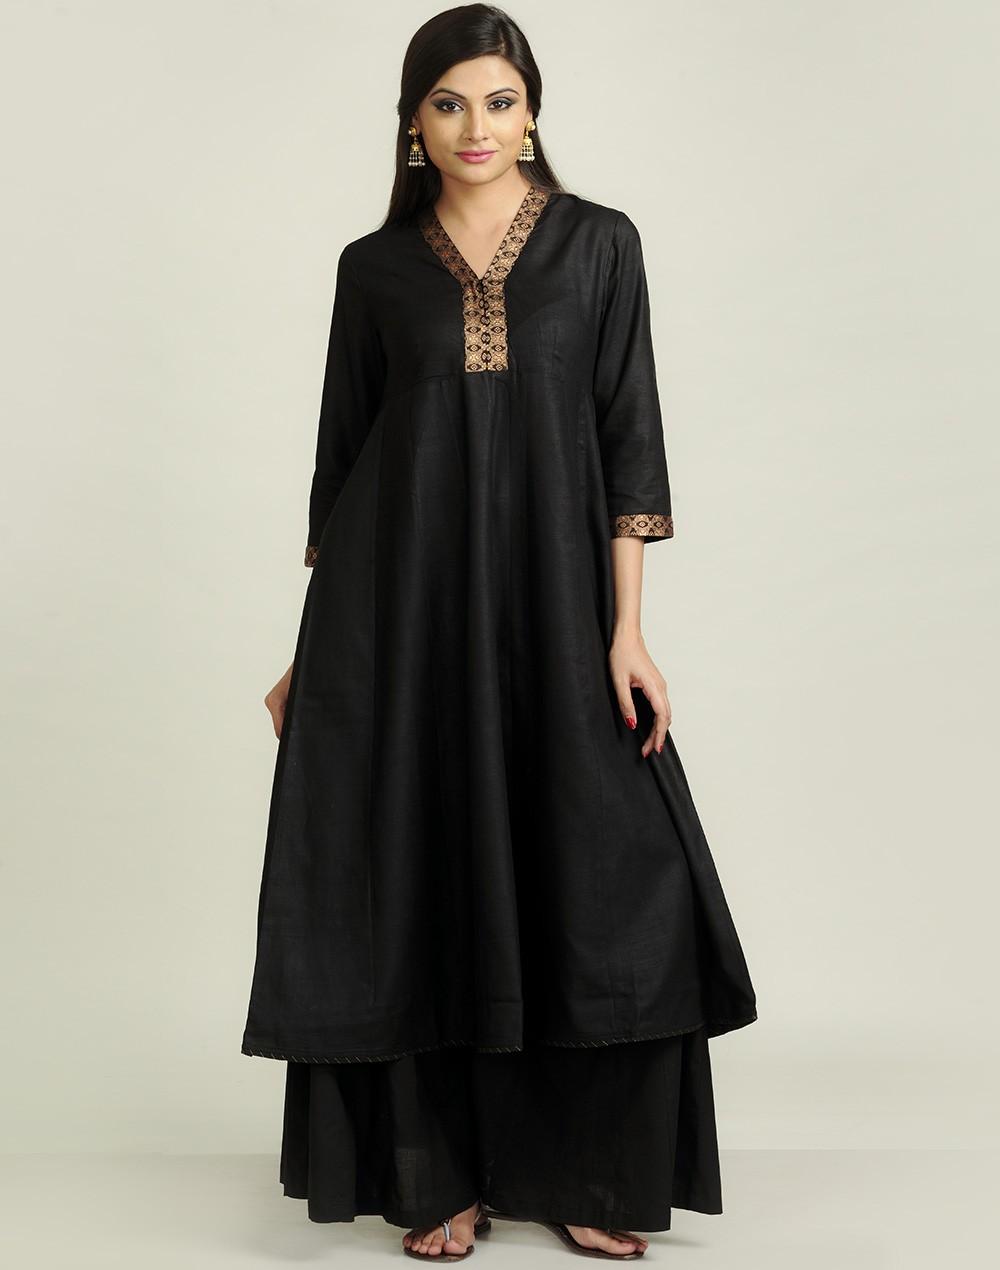 New Ladies Kurta Designs 2015-2016 Trend In India And ...